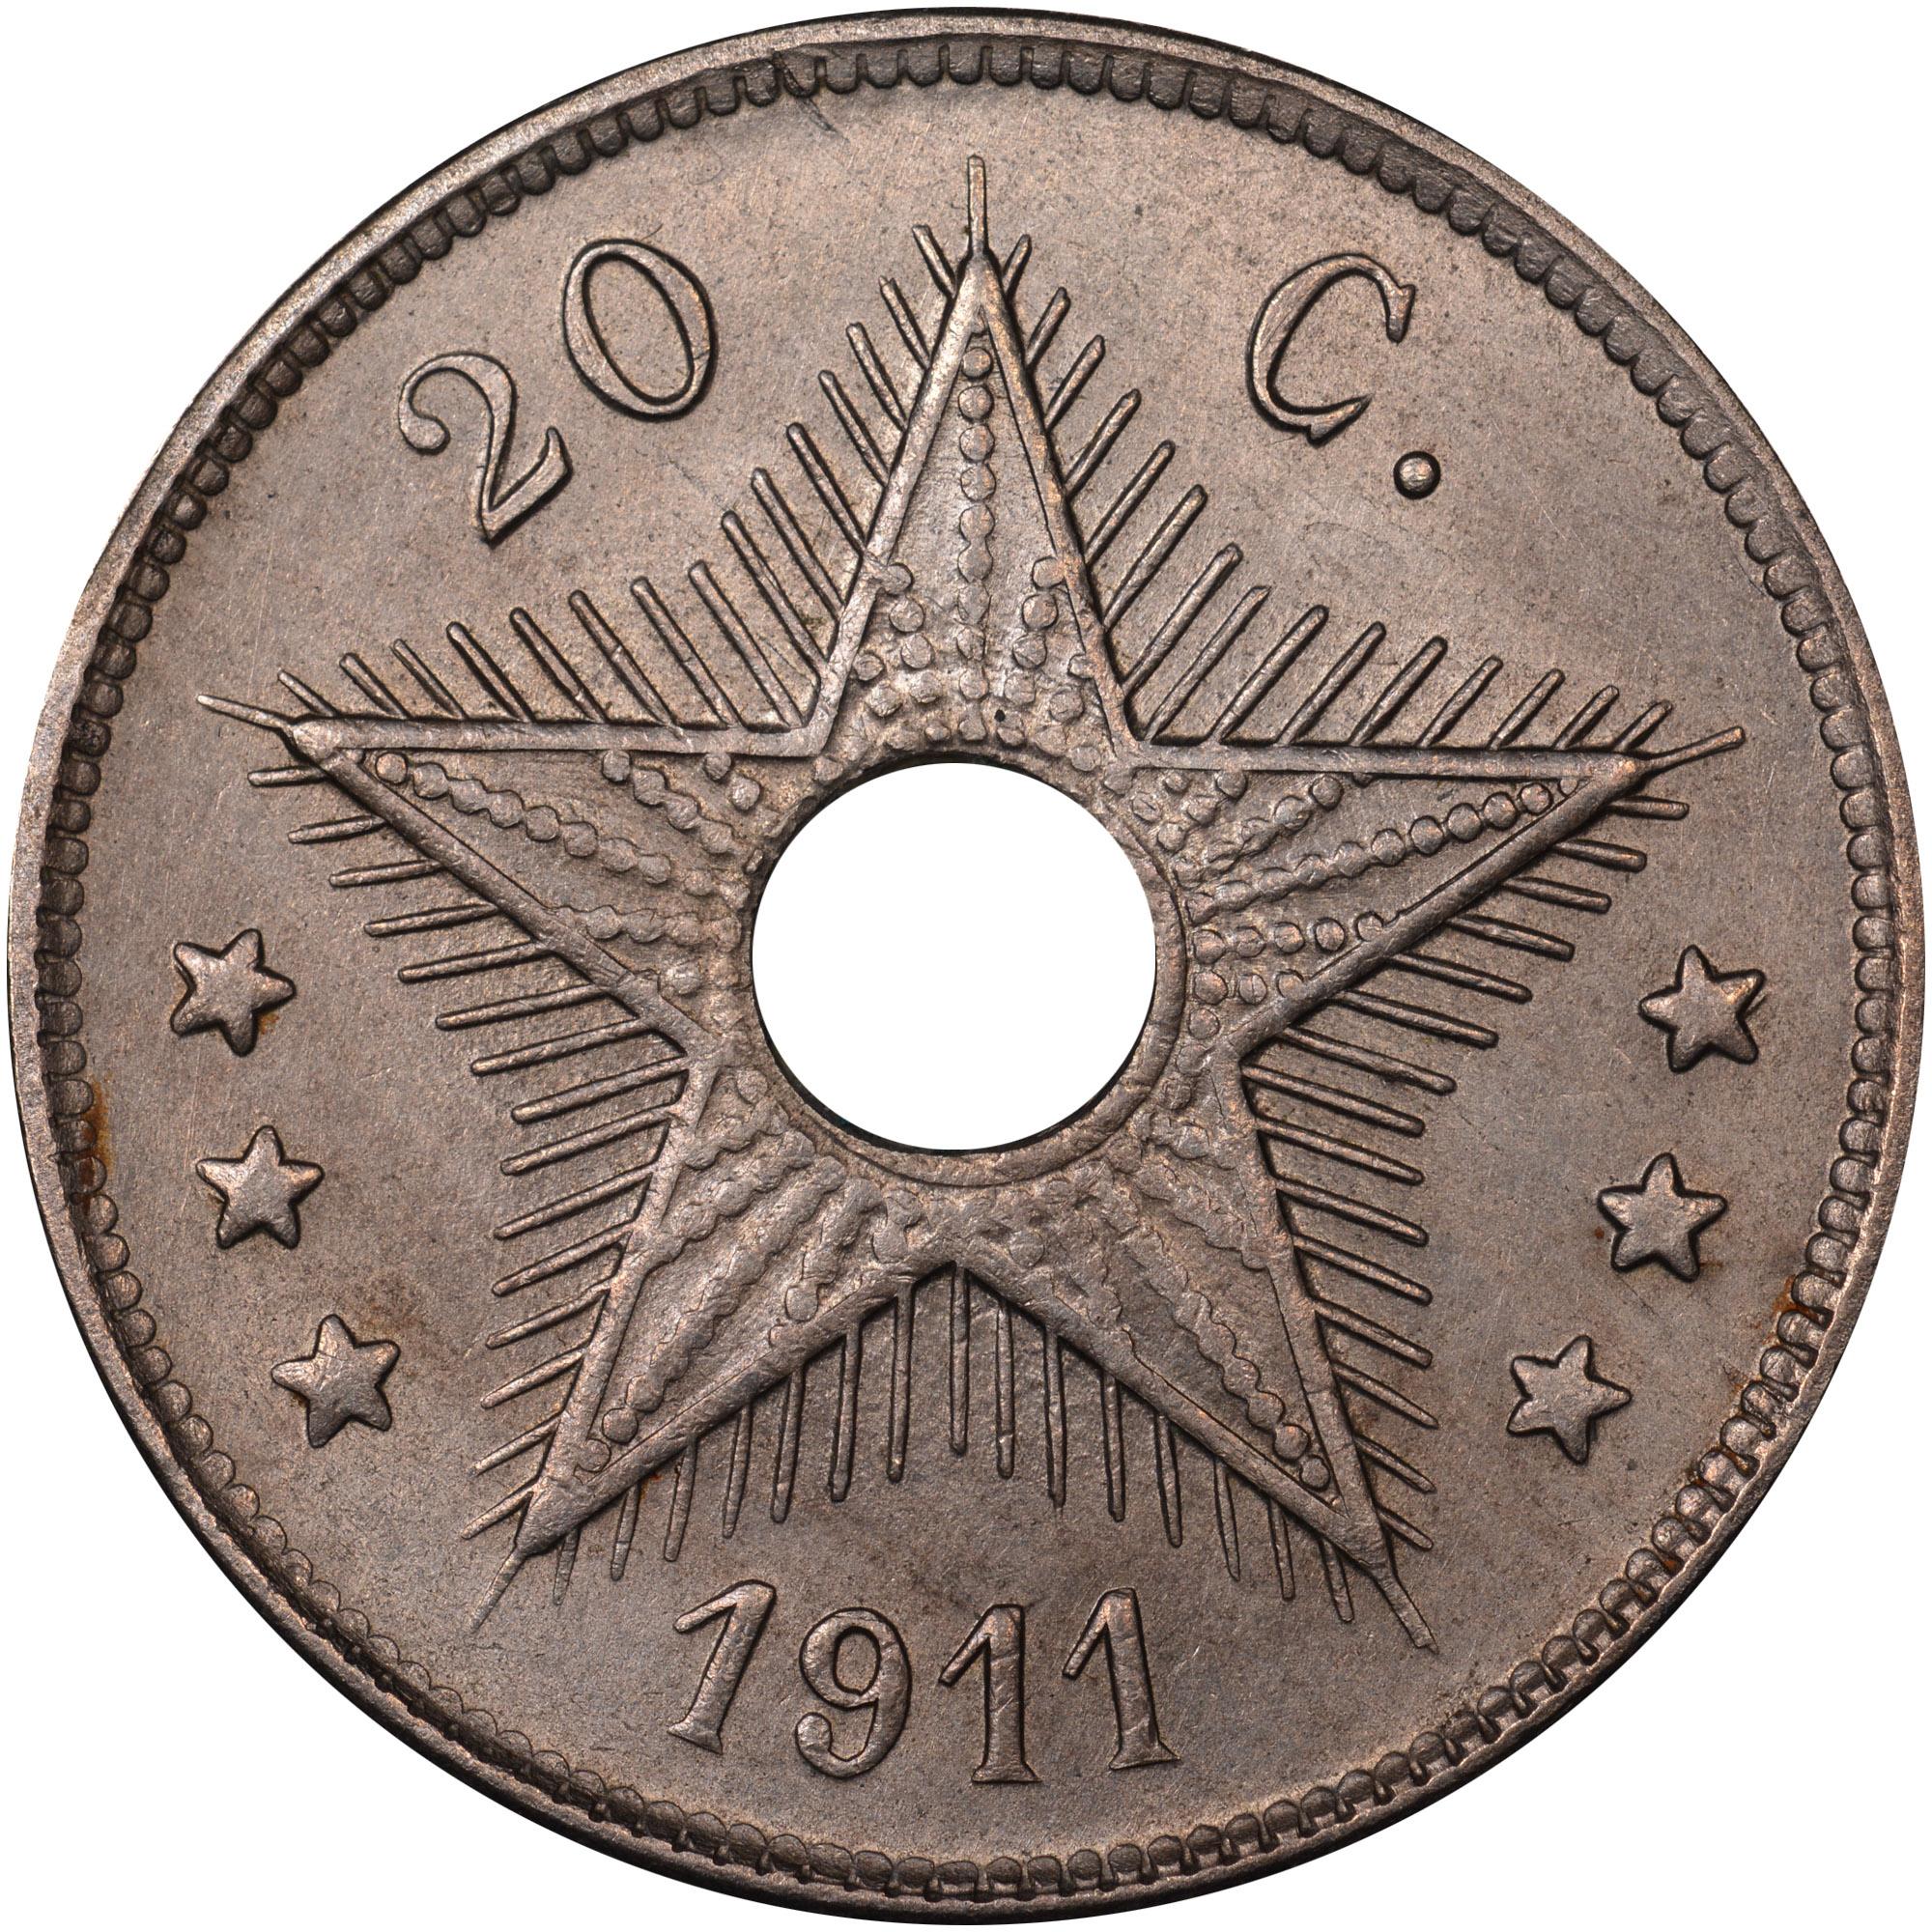 1910-1911 Belgian Congo 20 Centimes reverse